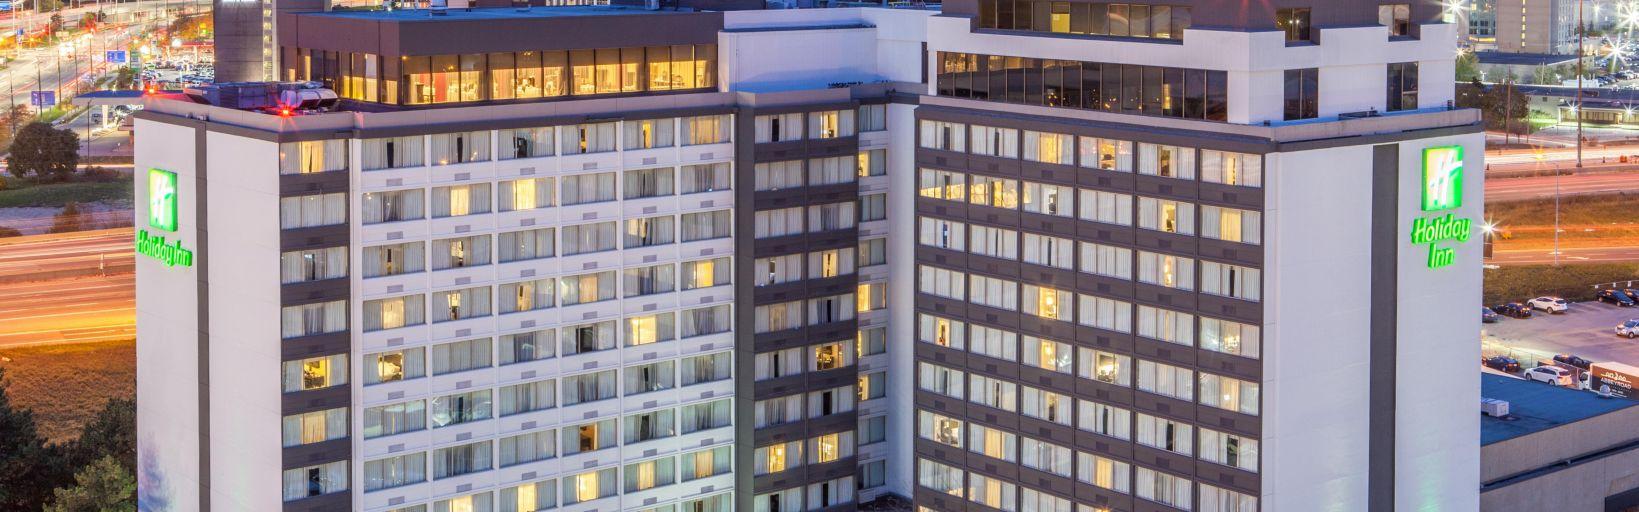 Hotel Exterior Evening View